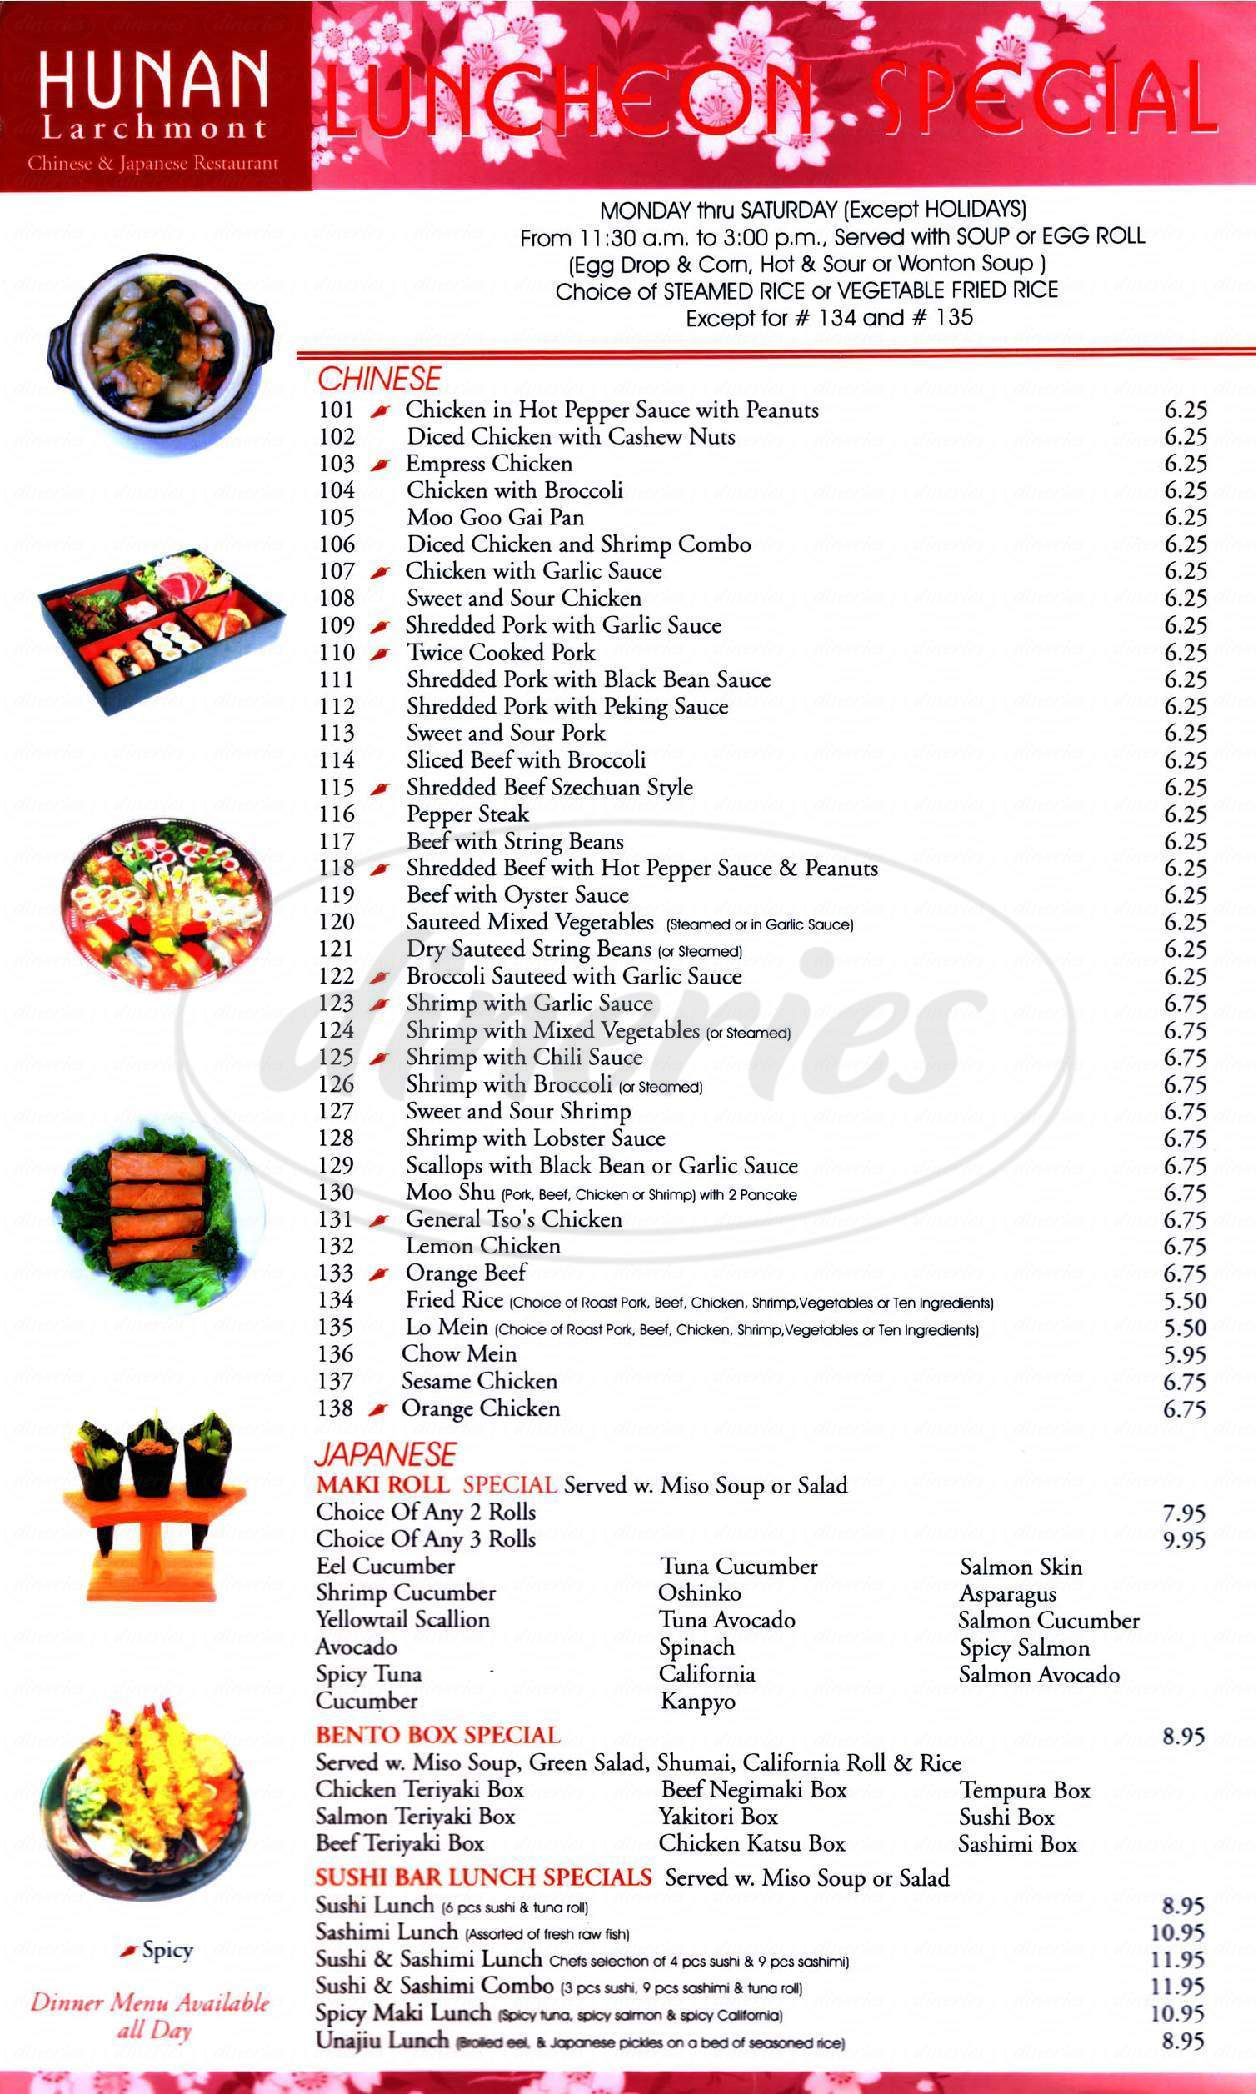 menu for Hunan Larchmont